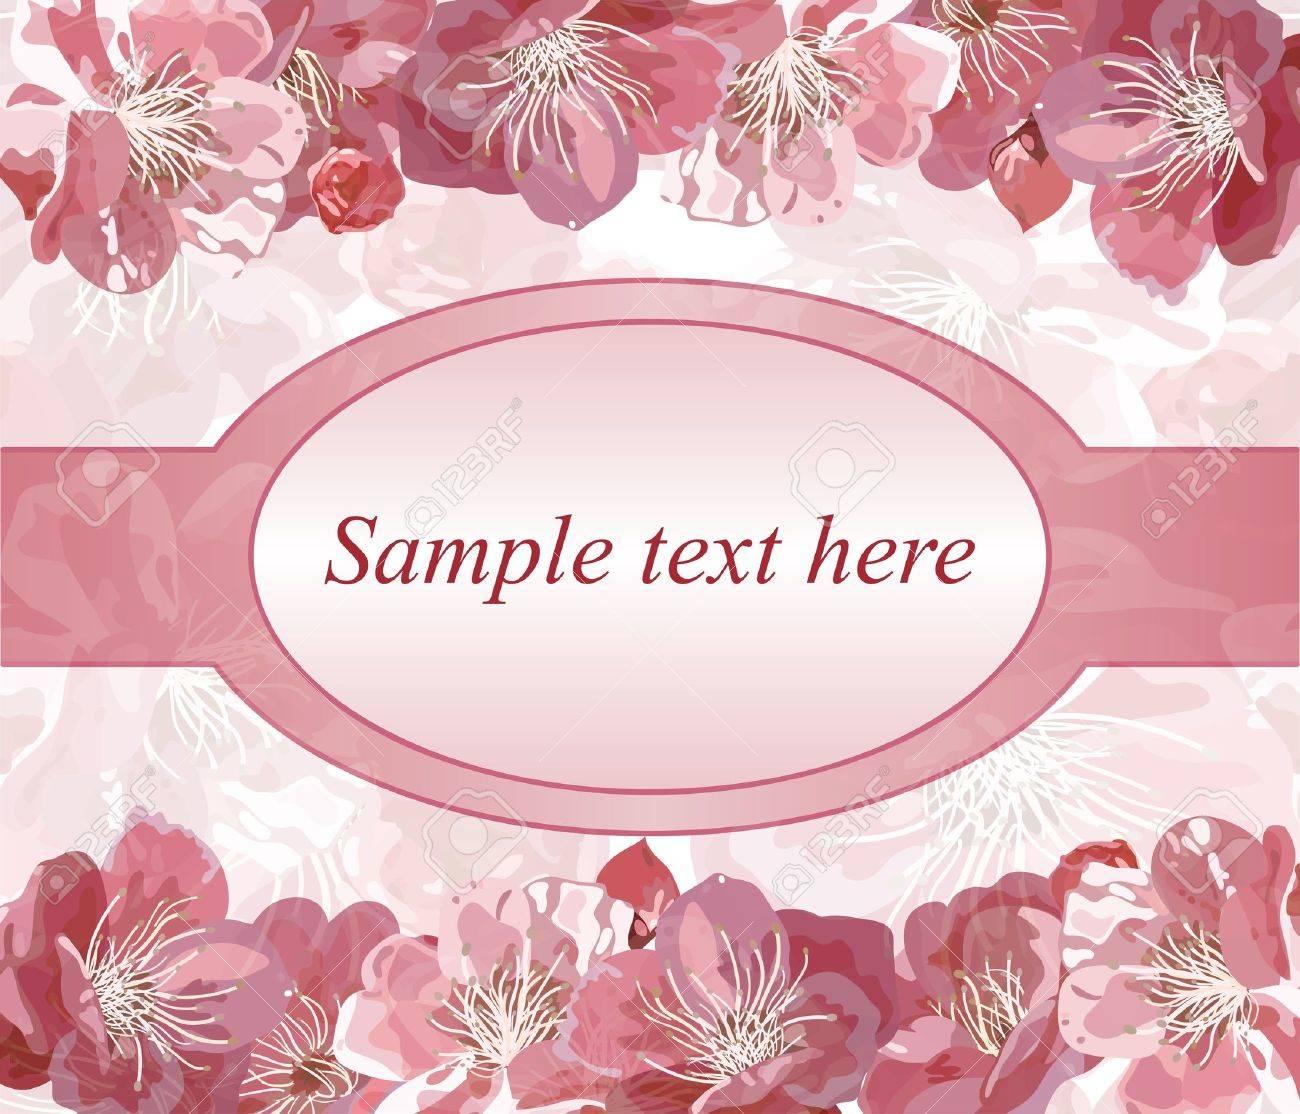 Invitation for wedding. Stock Vector - 12346622